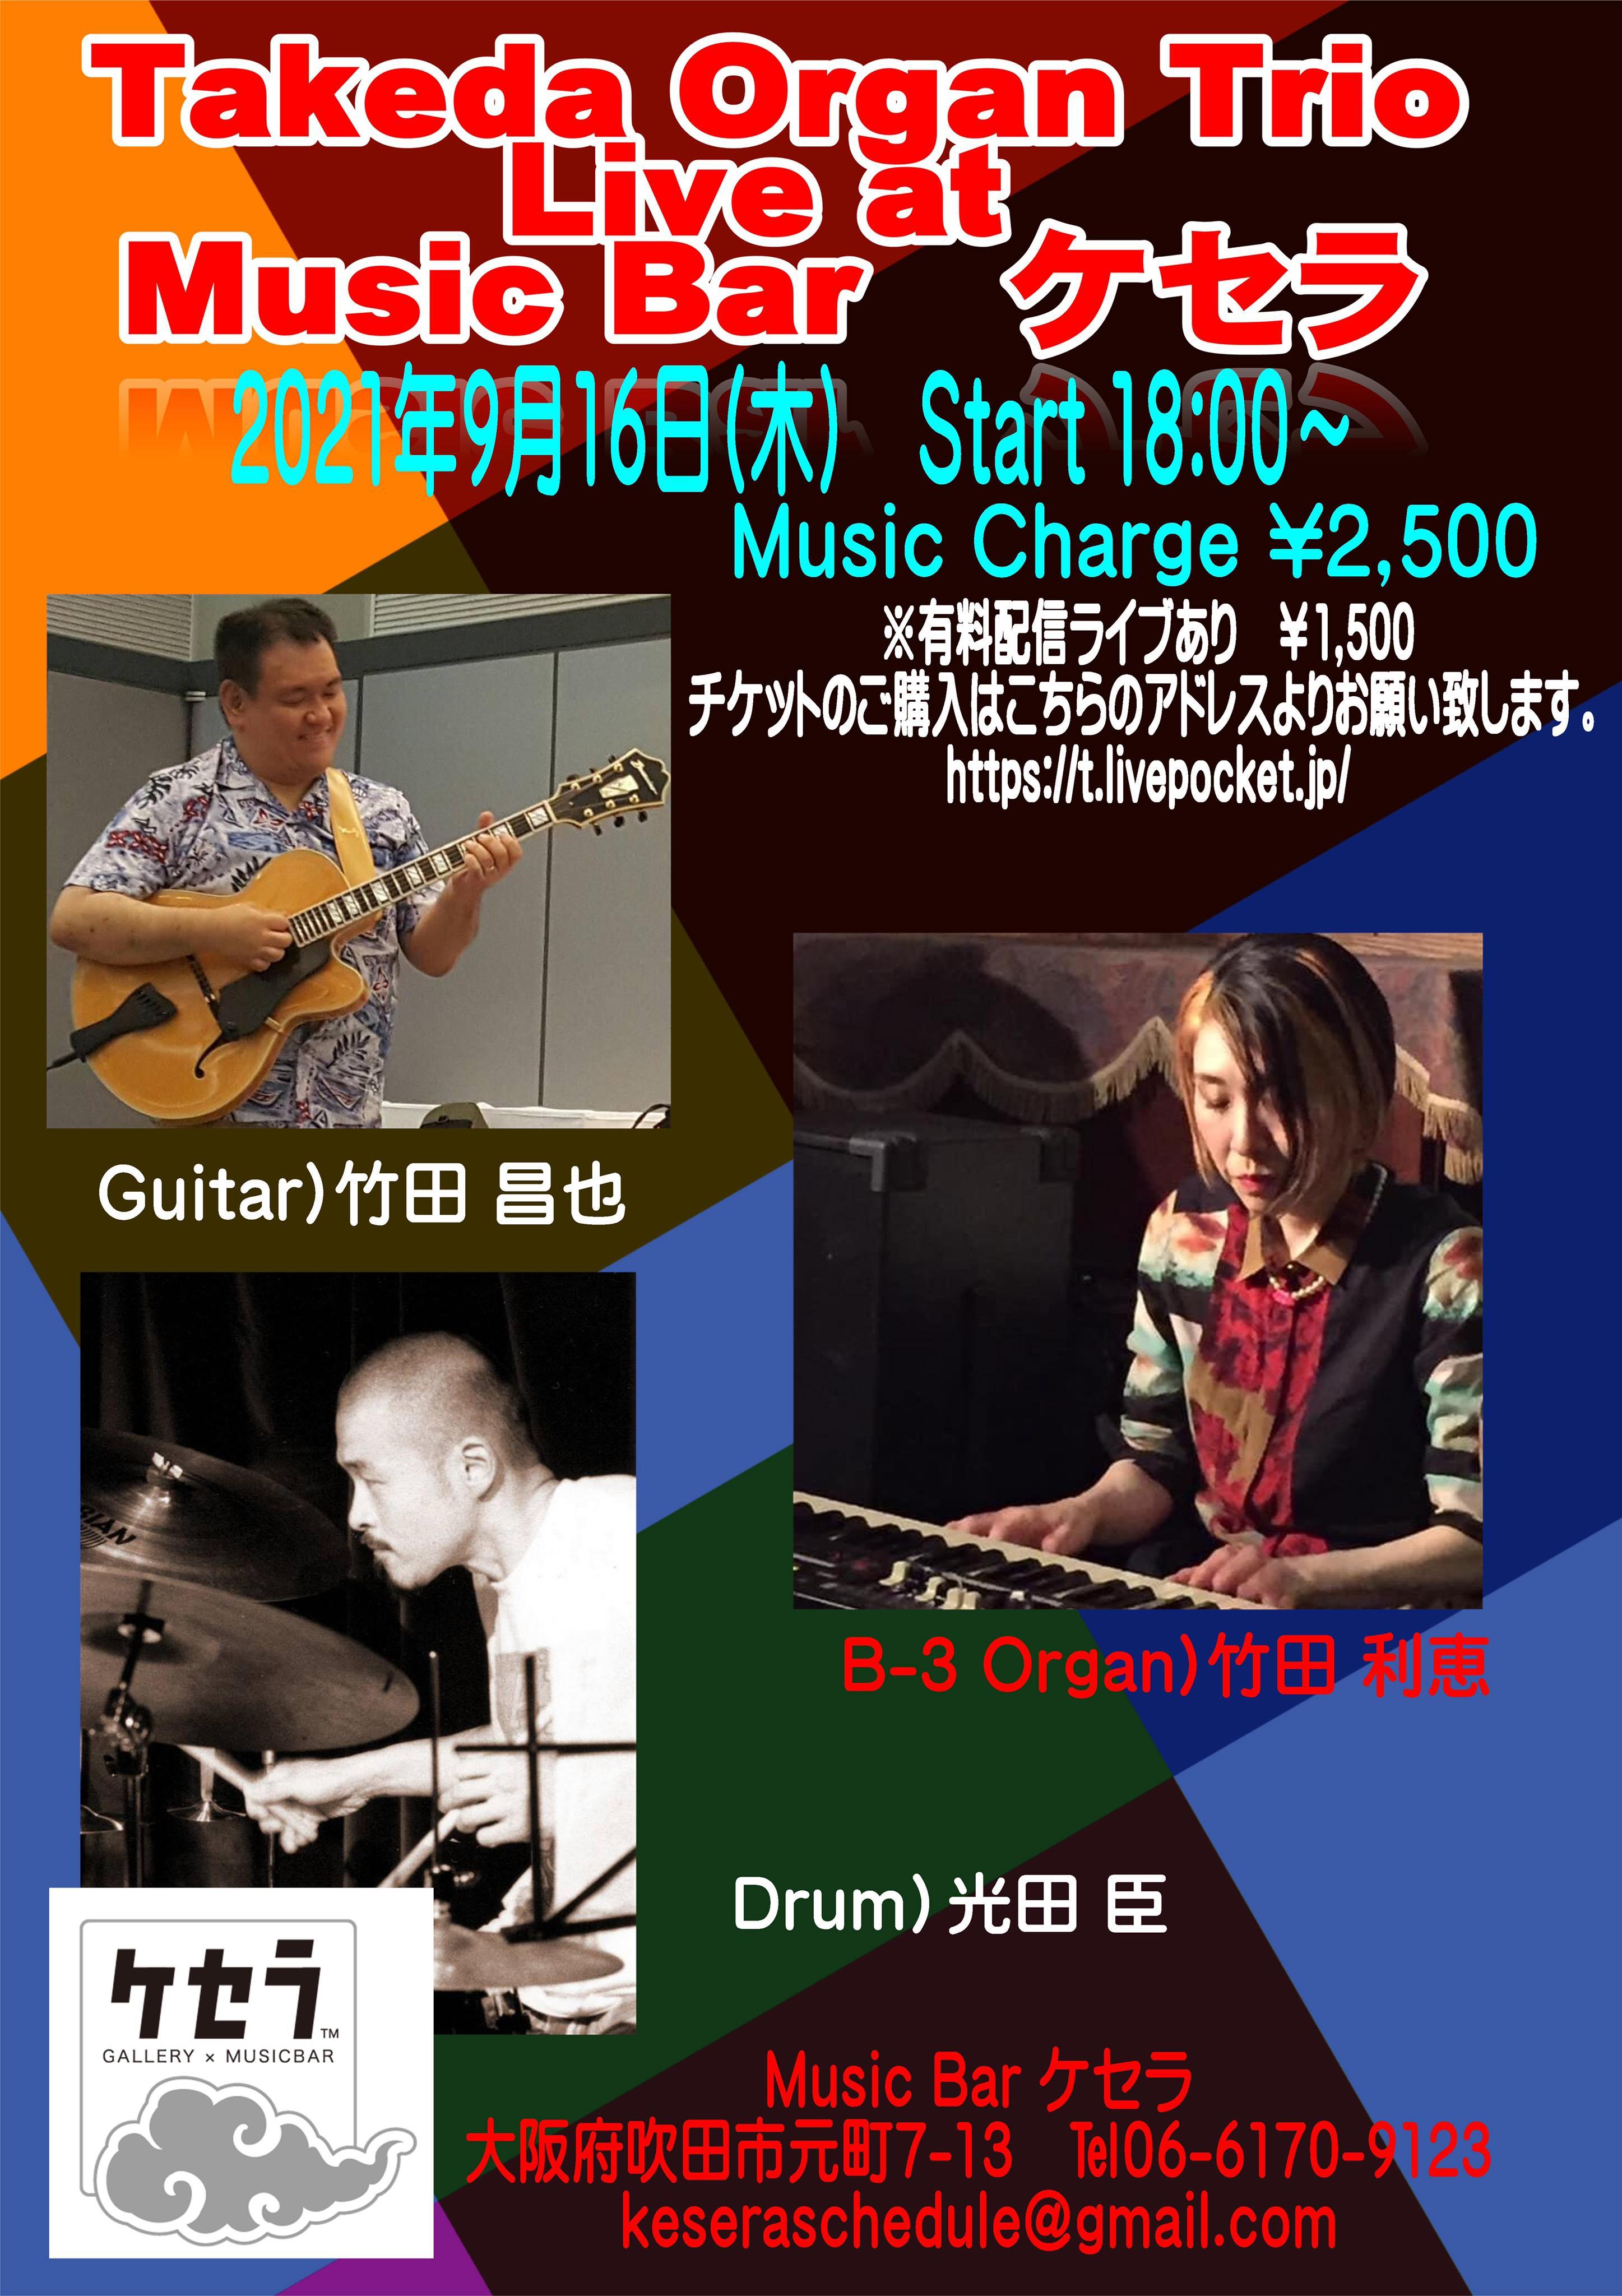 9/16 Takeda Organ Trio (開始時間が18時になりました)